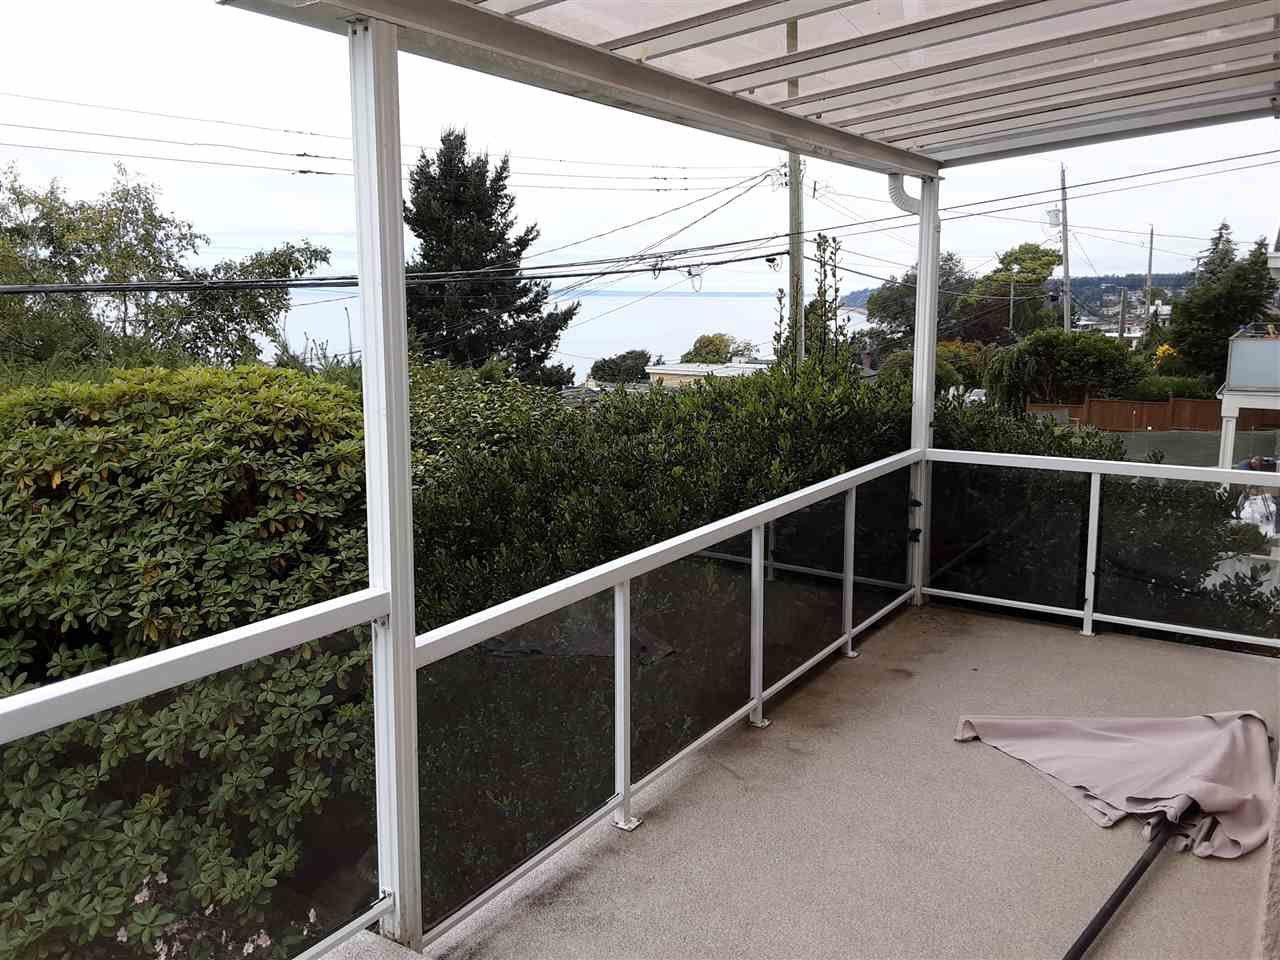 Photo 16: Photos: 15291 COLUMBIA Avenue: White Rock House for sale (South Surrey White Rock)  : MLS®# R2492863